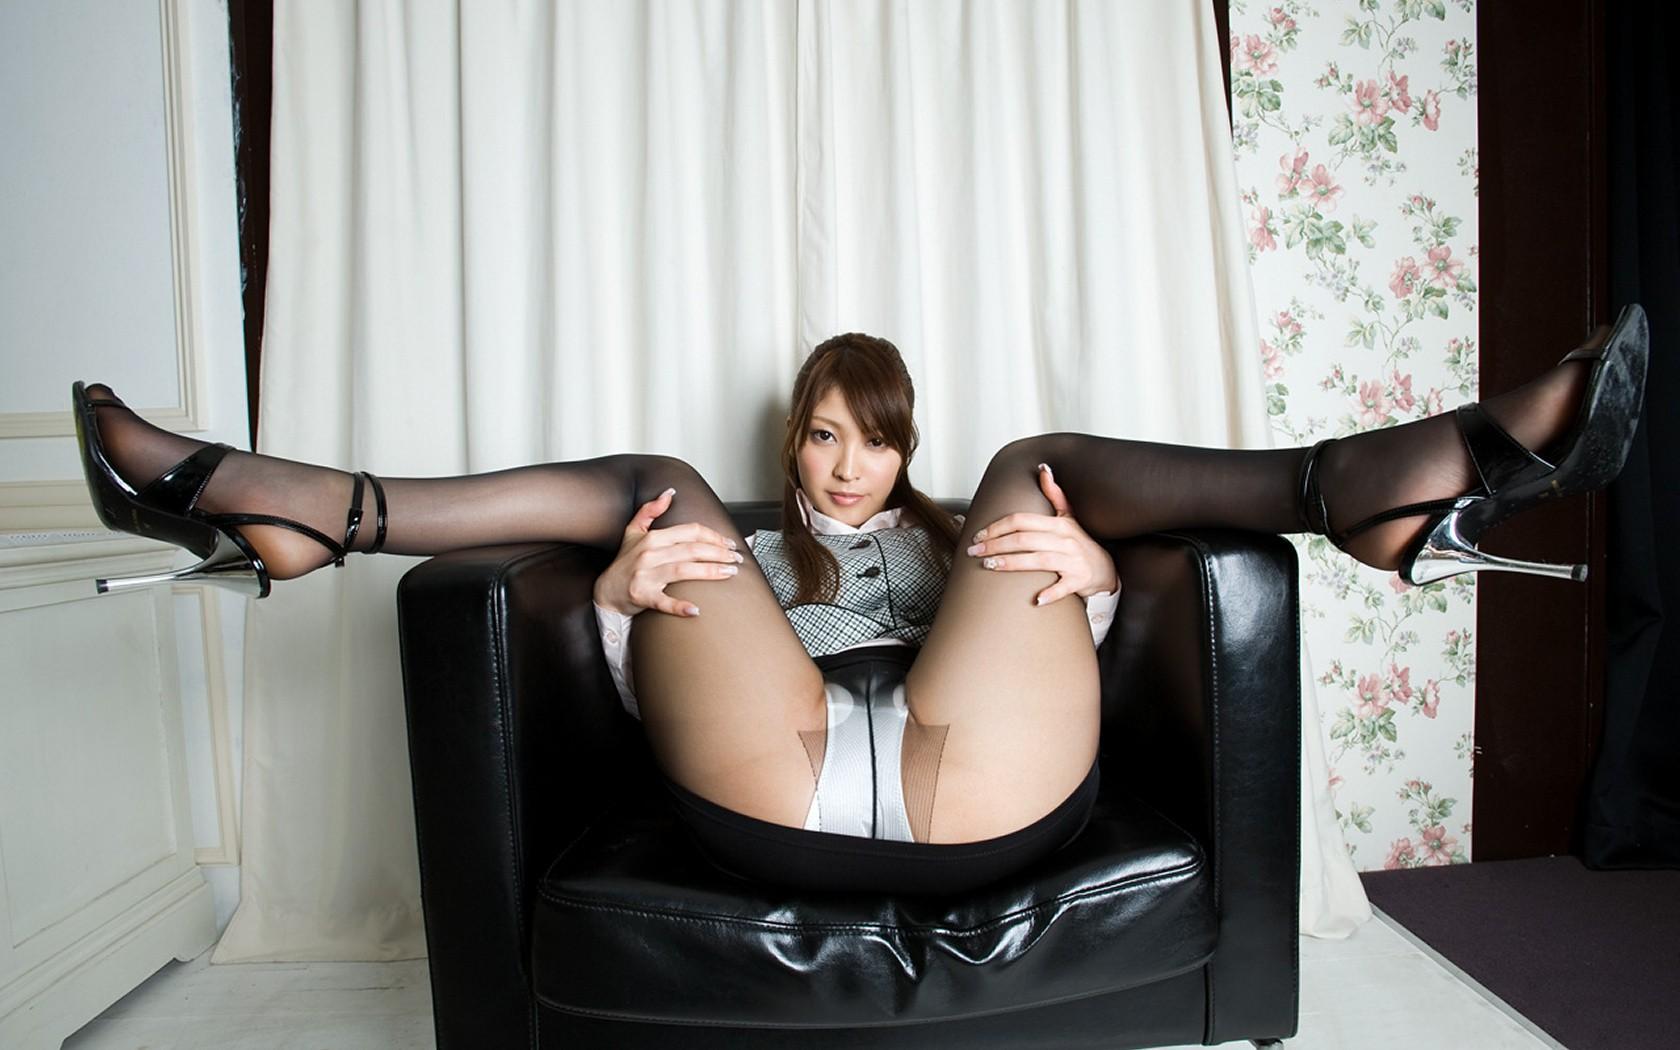 Фото между ног у азиаток фото 4 фотография